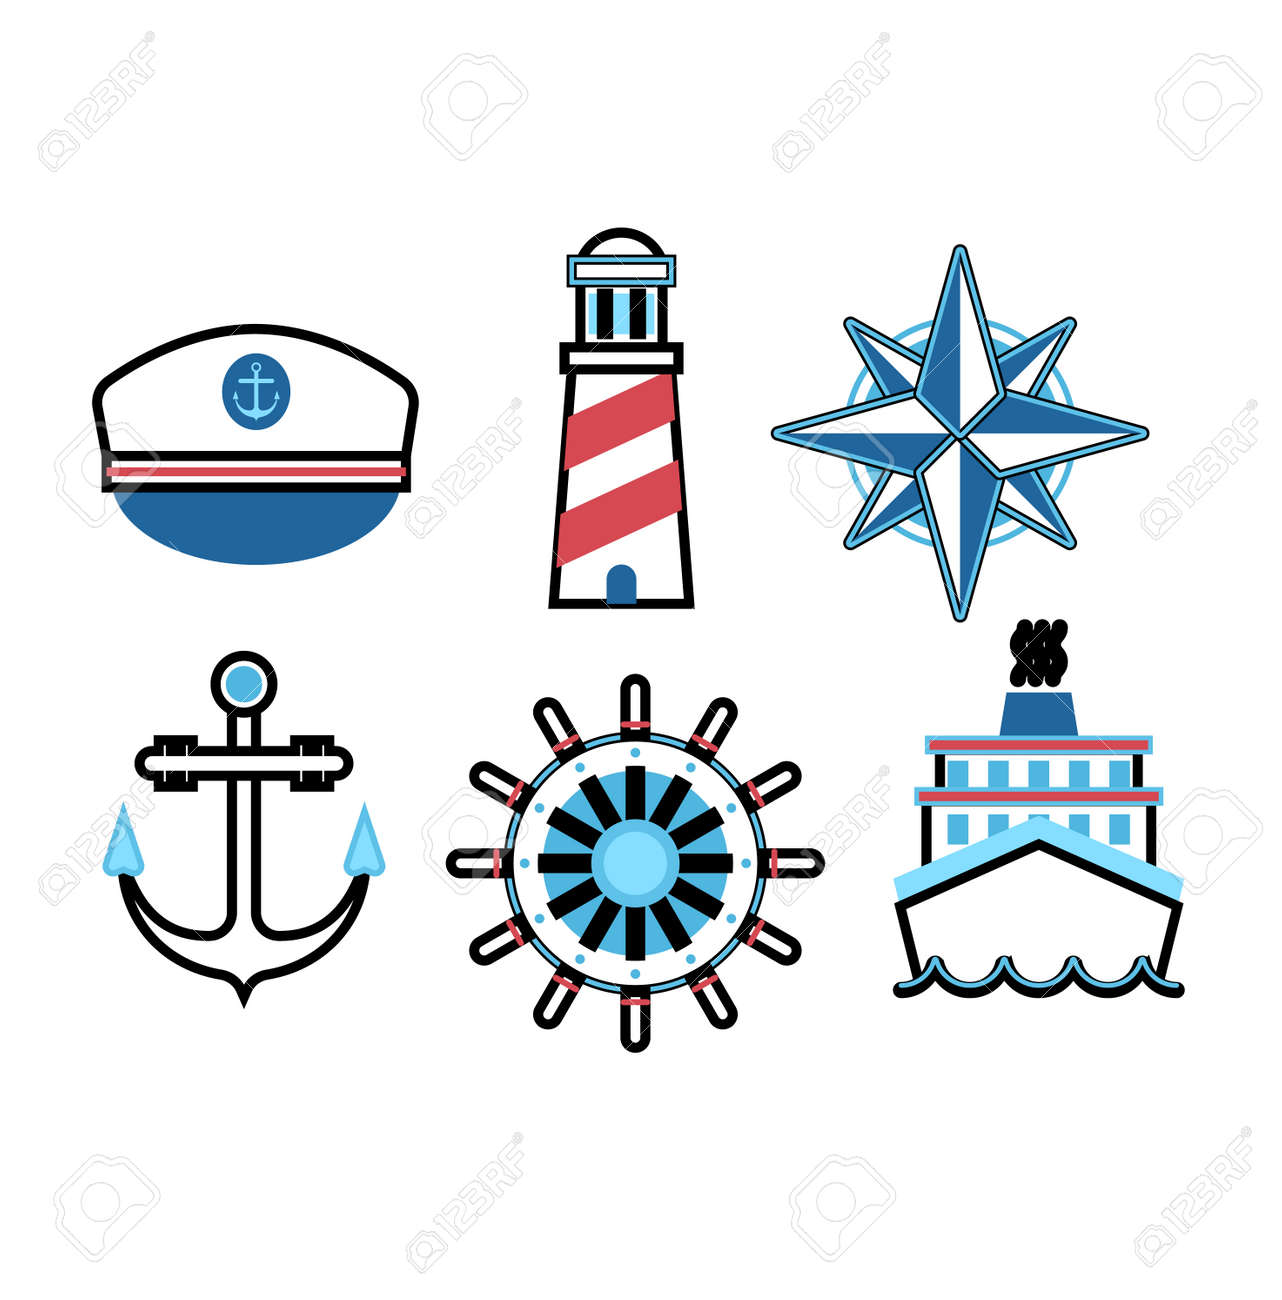 set of marine sea icons and nautical decorations isolated